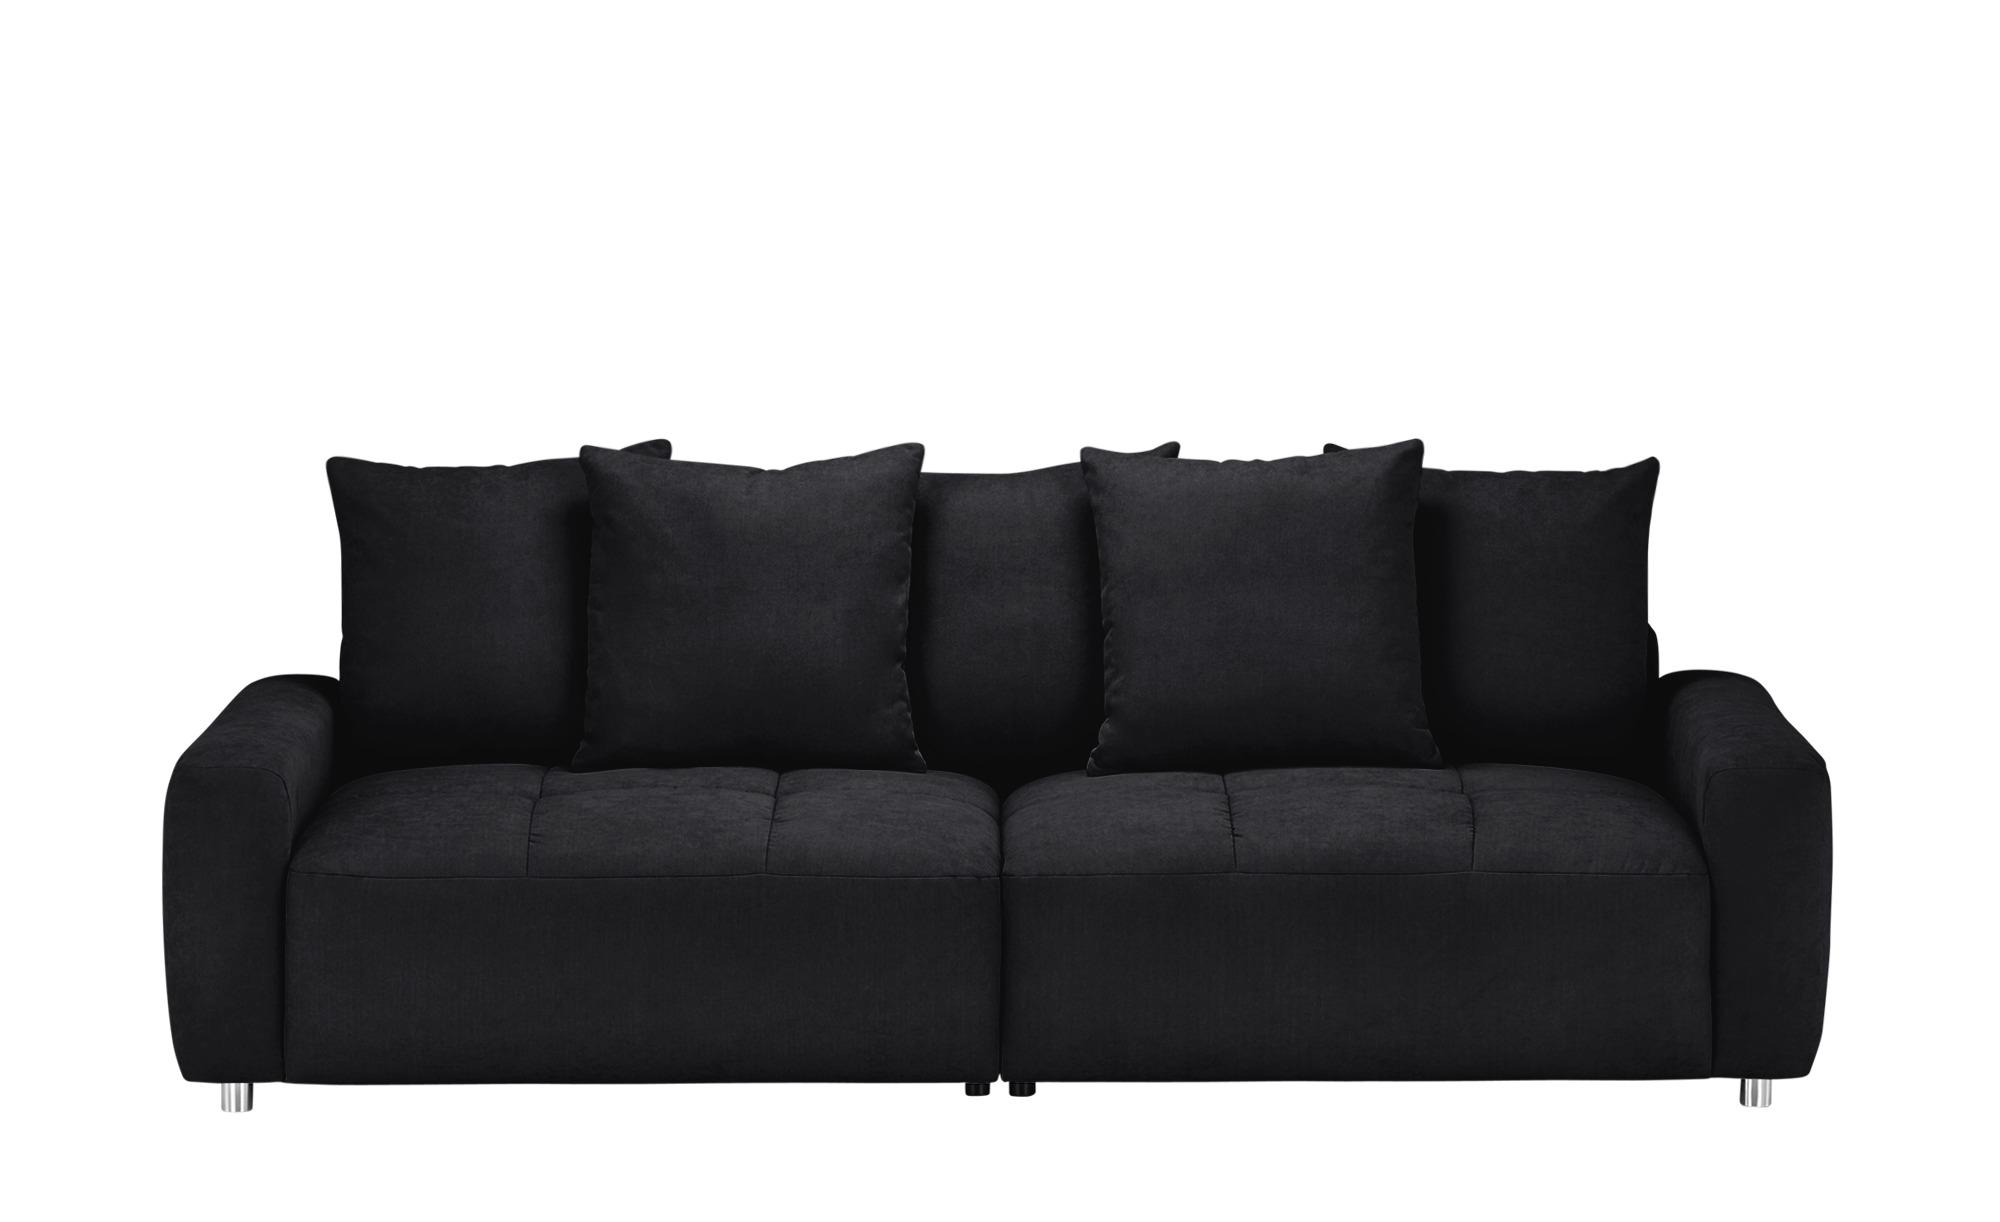 bobb Big Sofa  Betty ¦ schwarz ¦ Maße (cm): B: 266 H: 90 T: 104 Polstermöbel > Sofas > Big-Sofas - Höffner